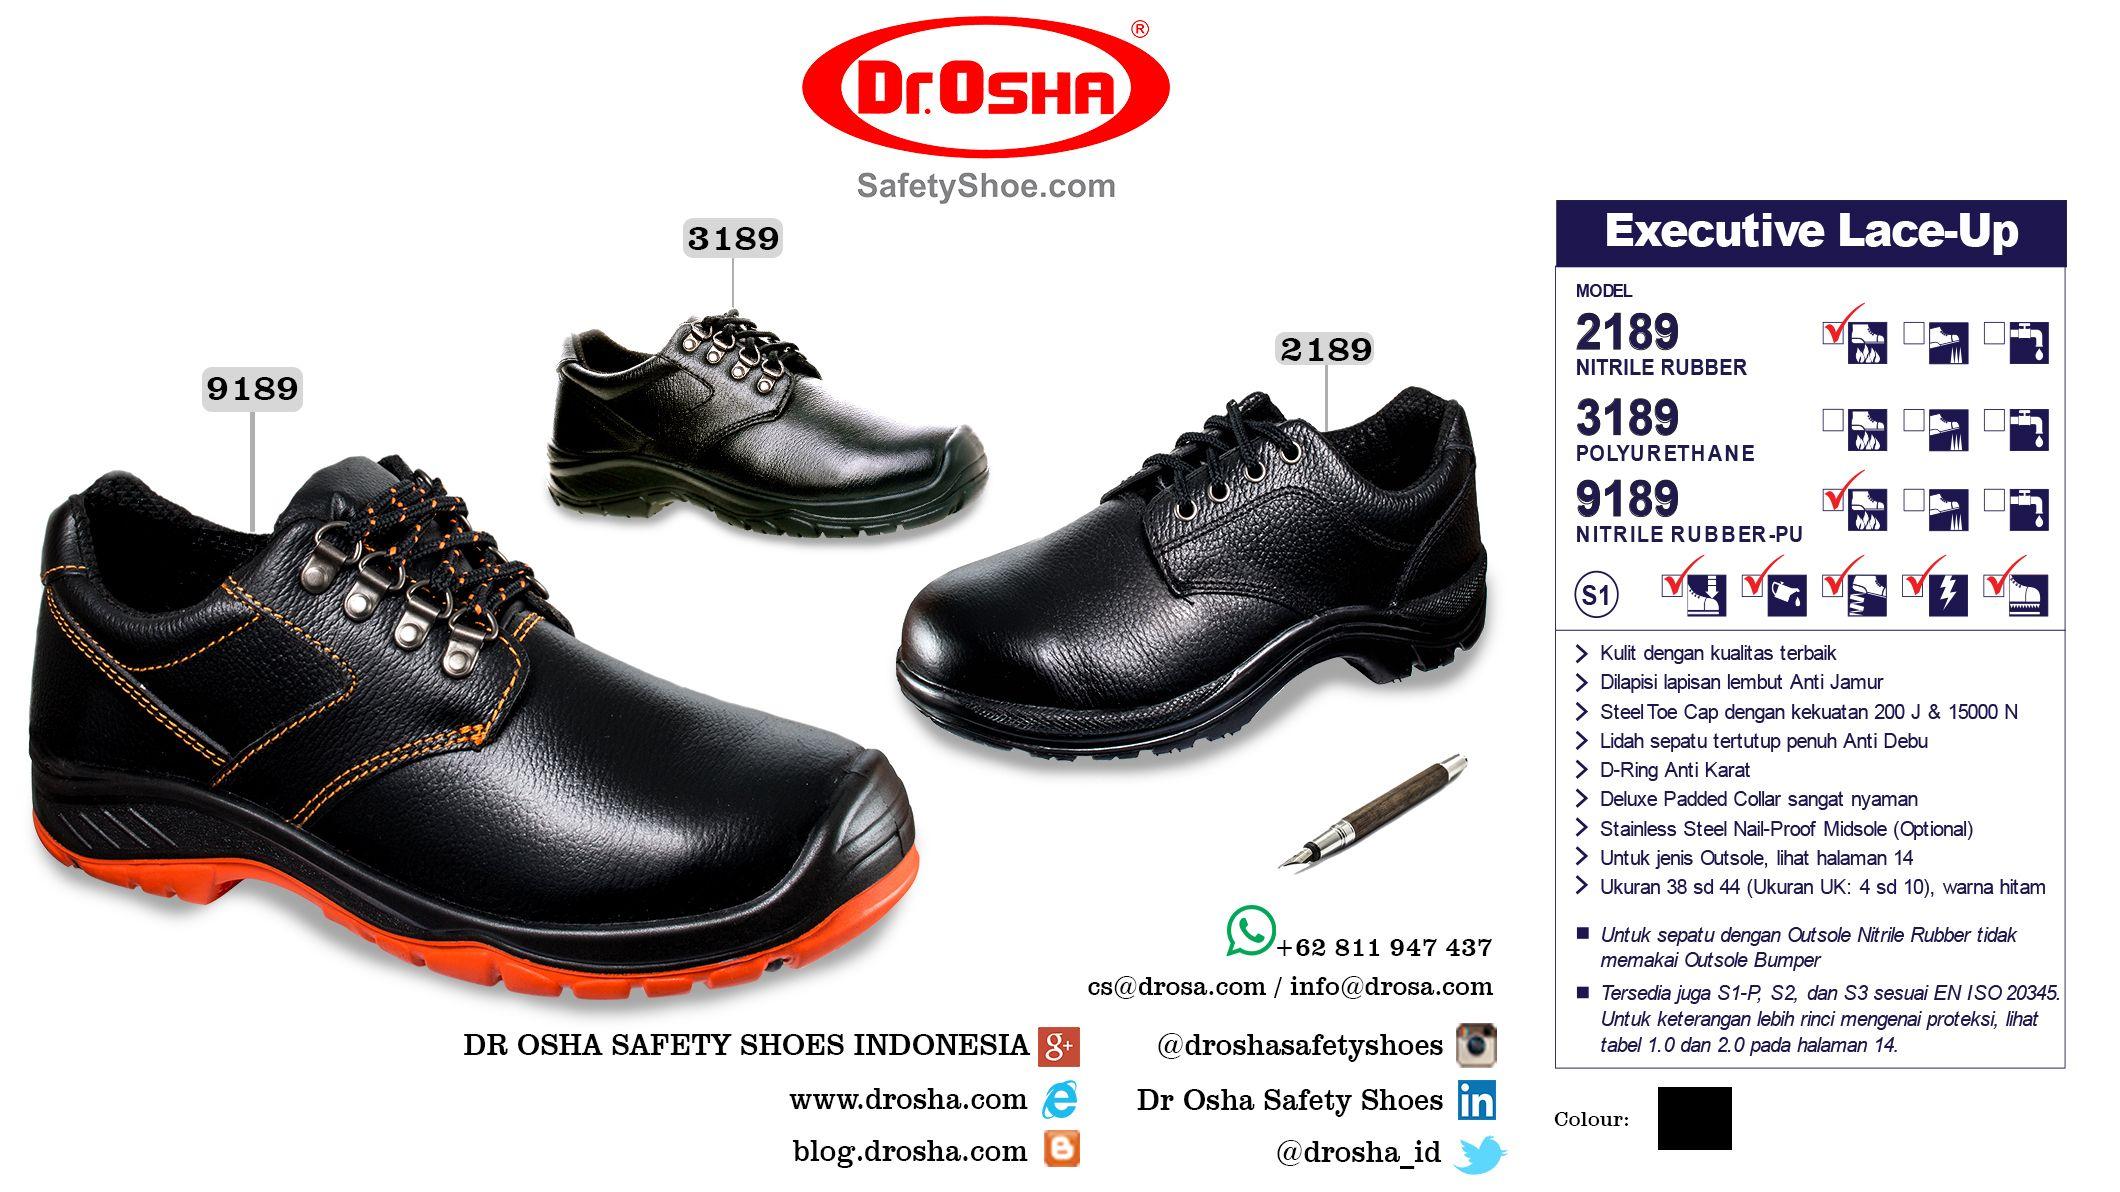 Dr Osha Safety Shoes Hero Straps 3188 Black Daftar Harga Terbaru Cheetah 7106ha Pin By Safetyfootwearco On Sepatu Drosha Commando Ankle Boot